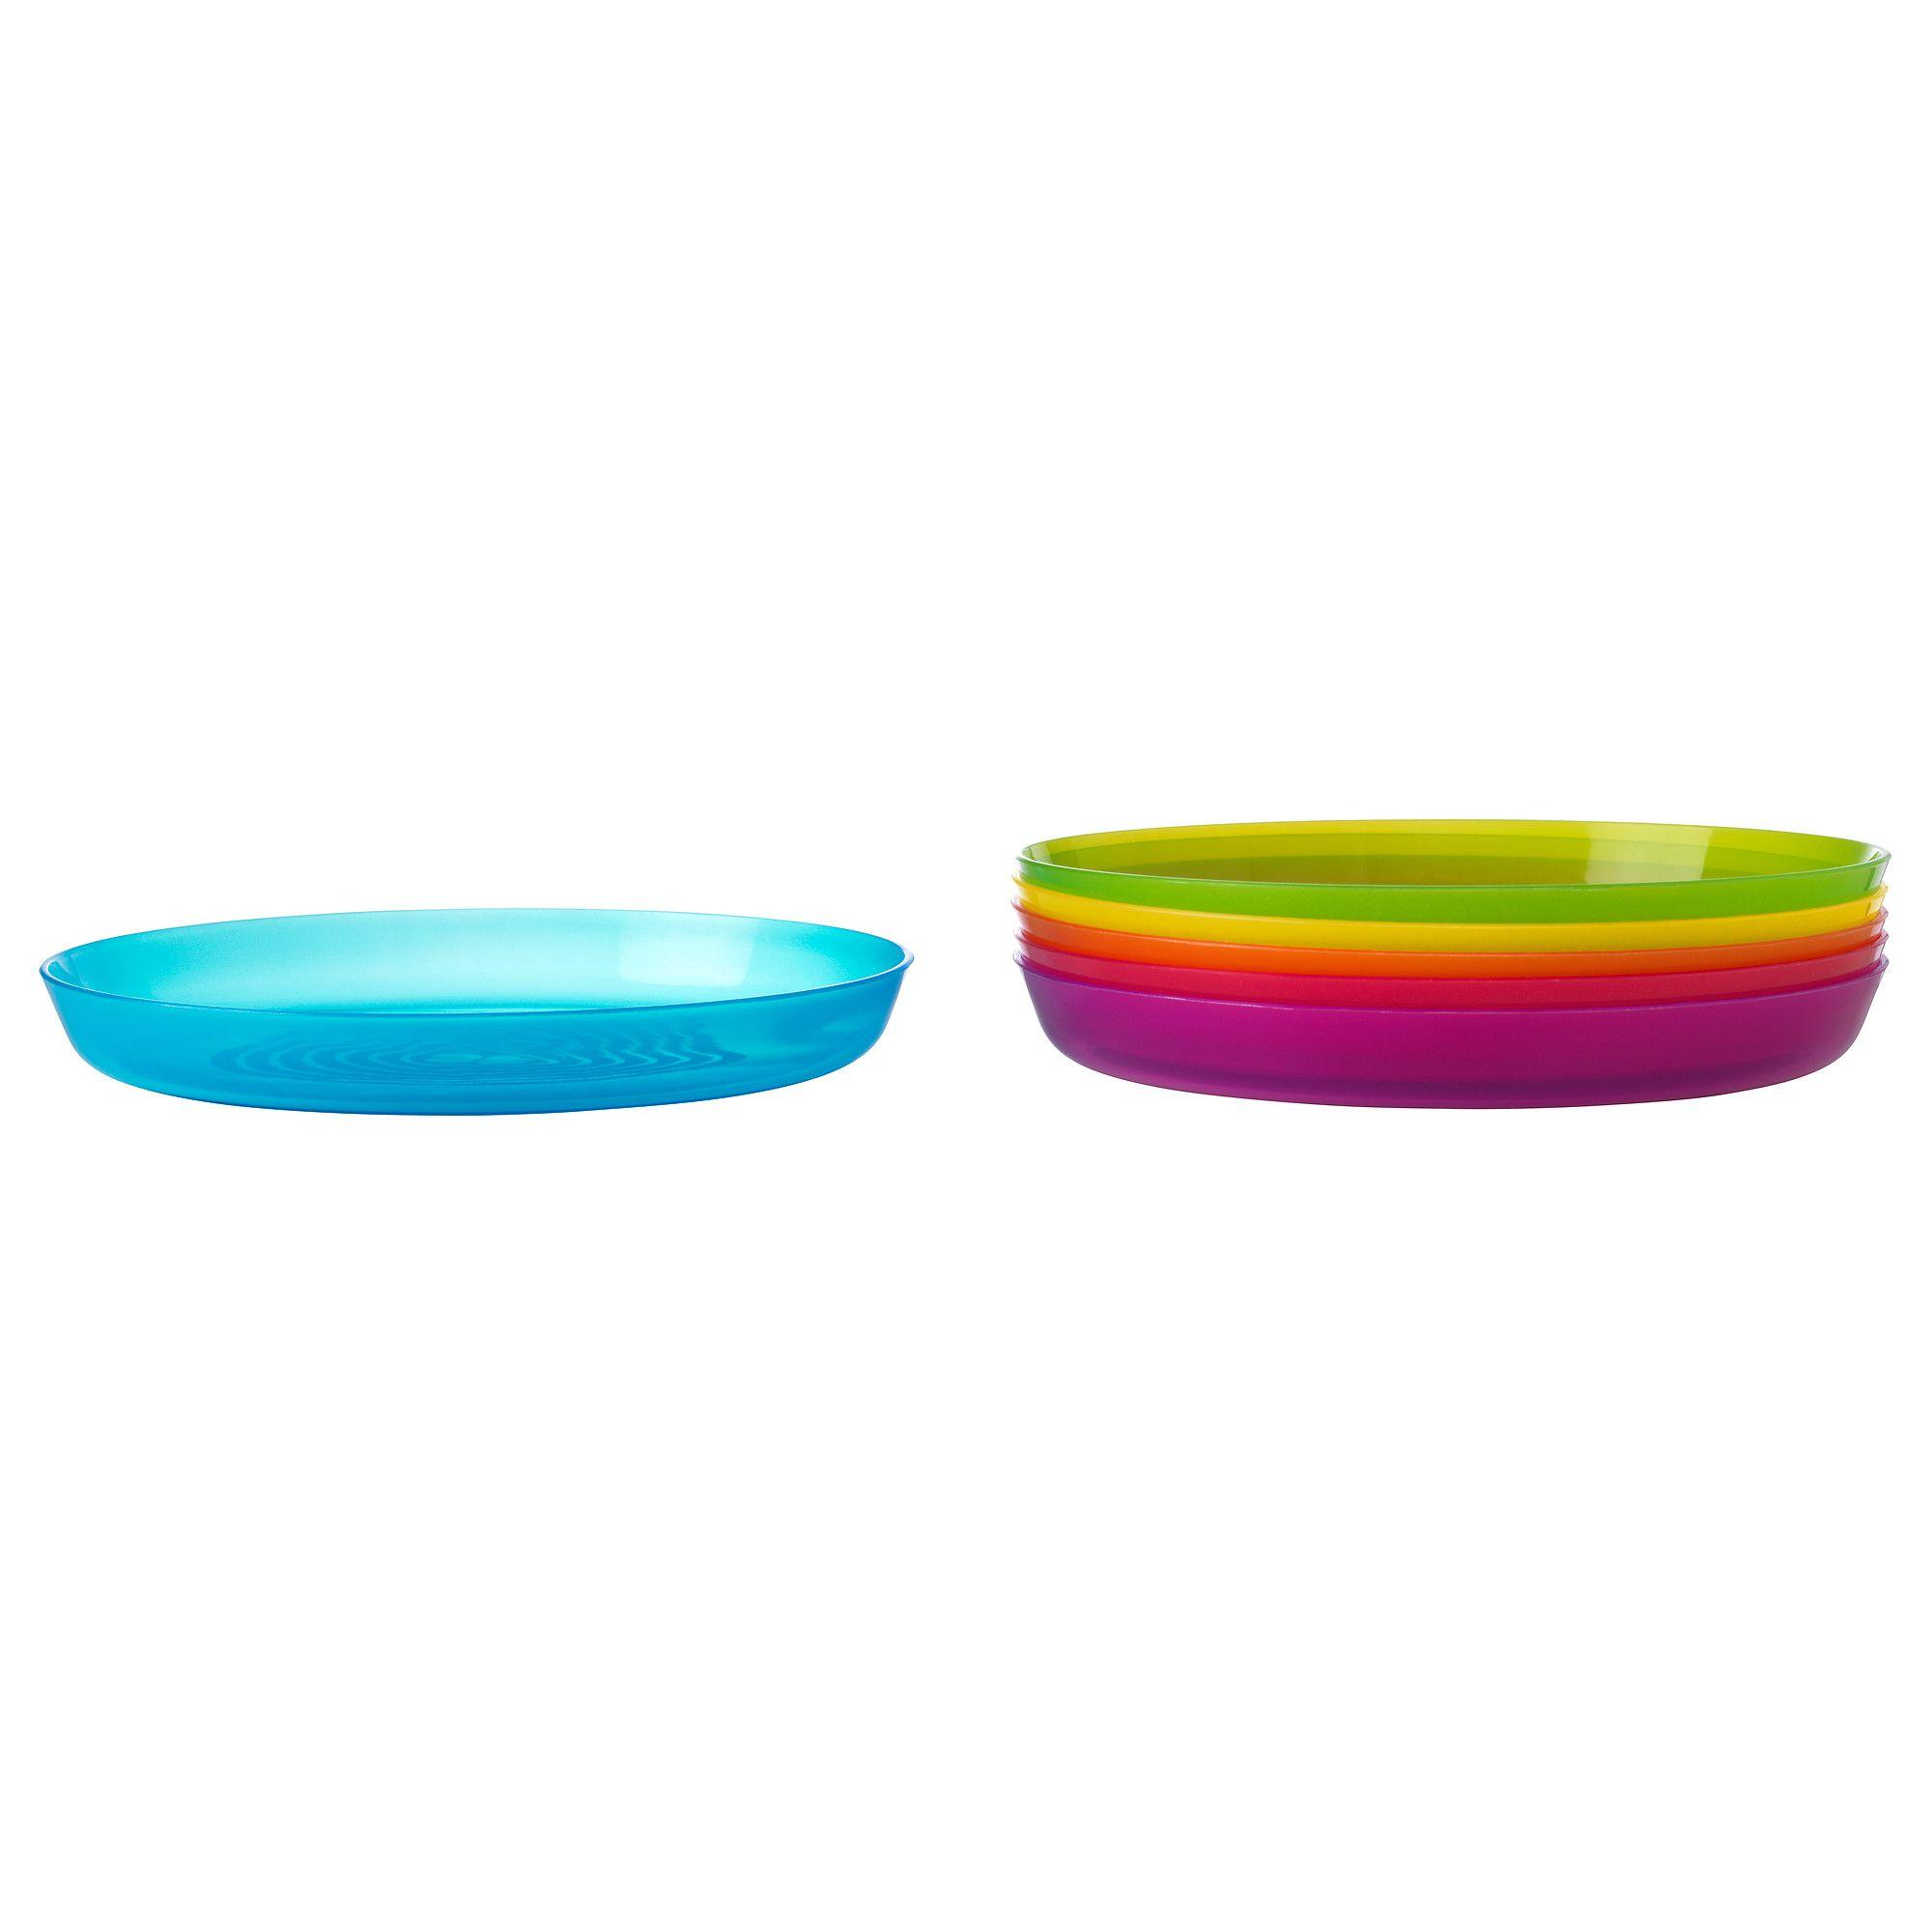 Ikea Australia Affordable Swedish Home Furniture Plastic Plates Plates Baby Cups